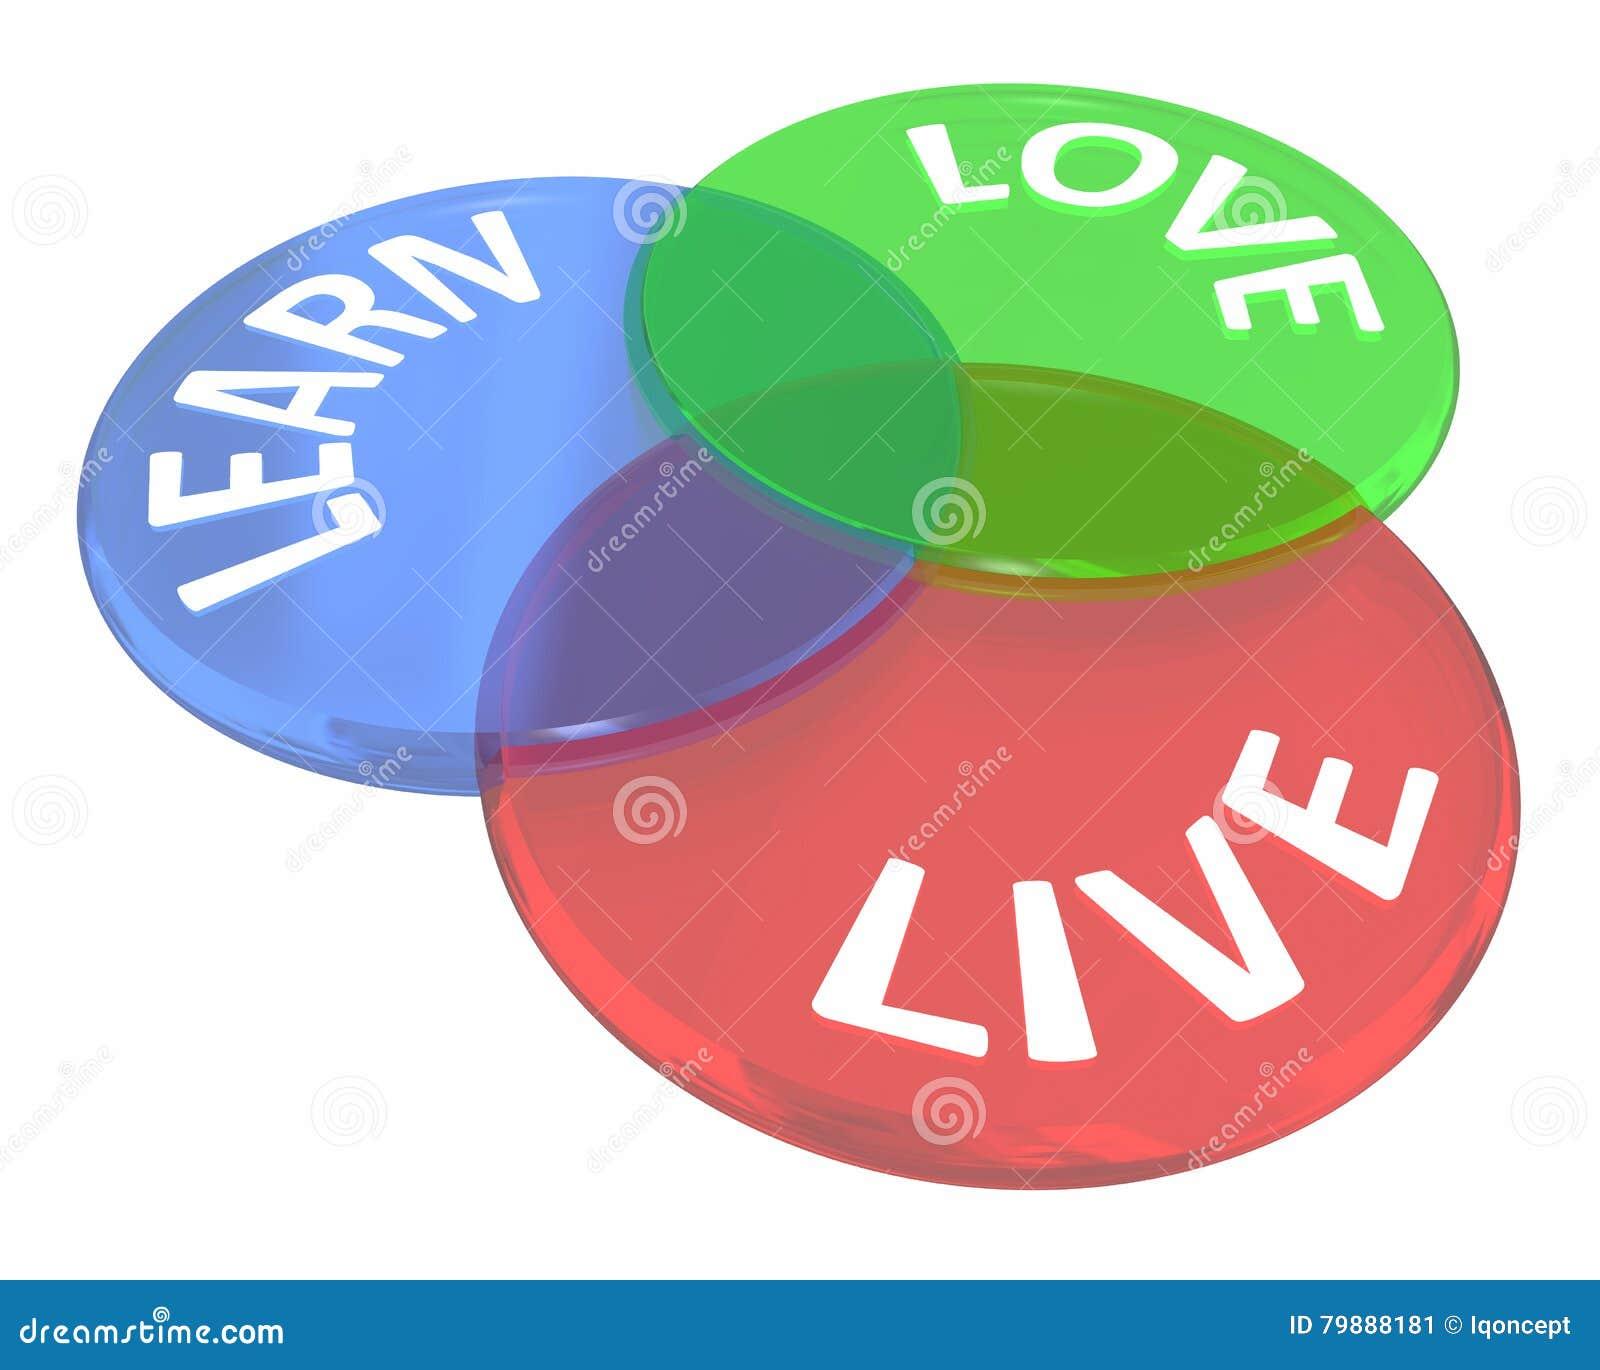 Live Learn Love Life Experience Venn Diagram Circles